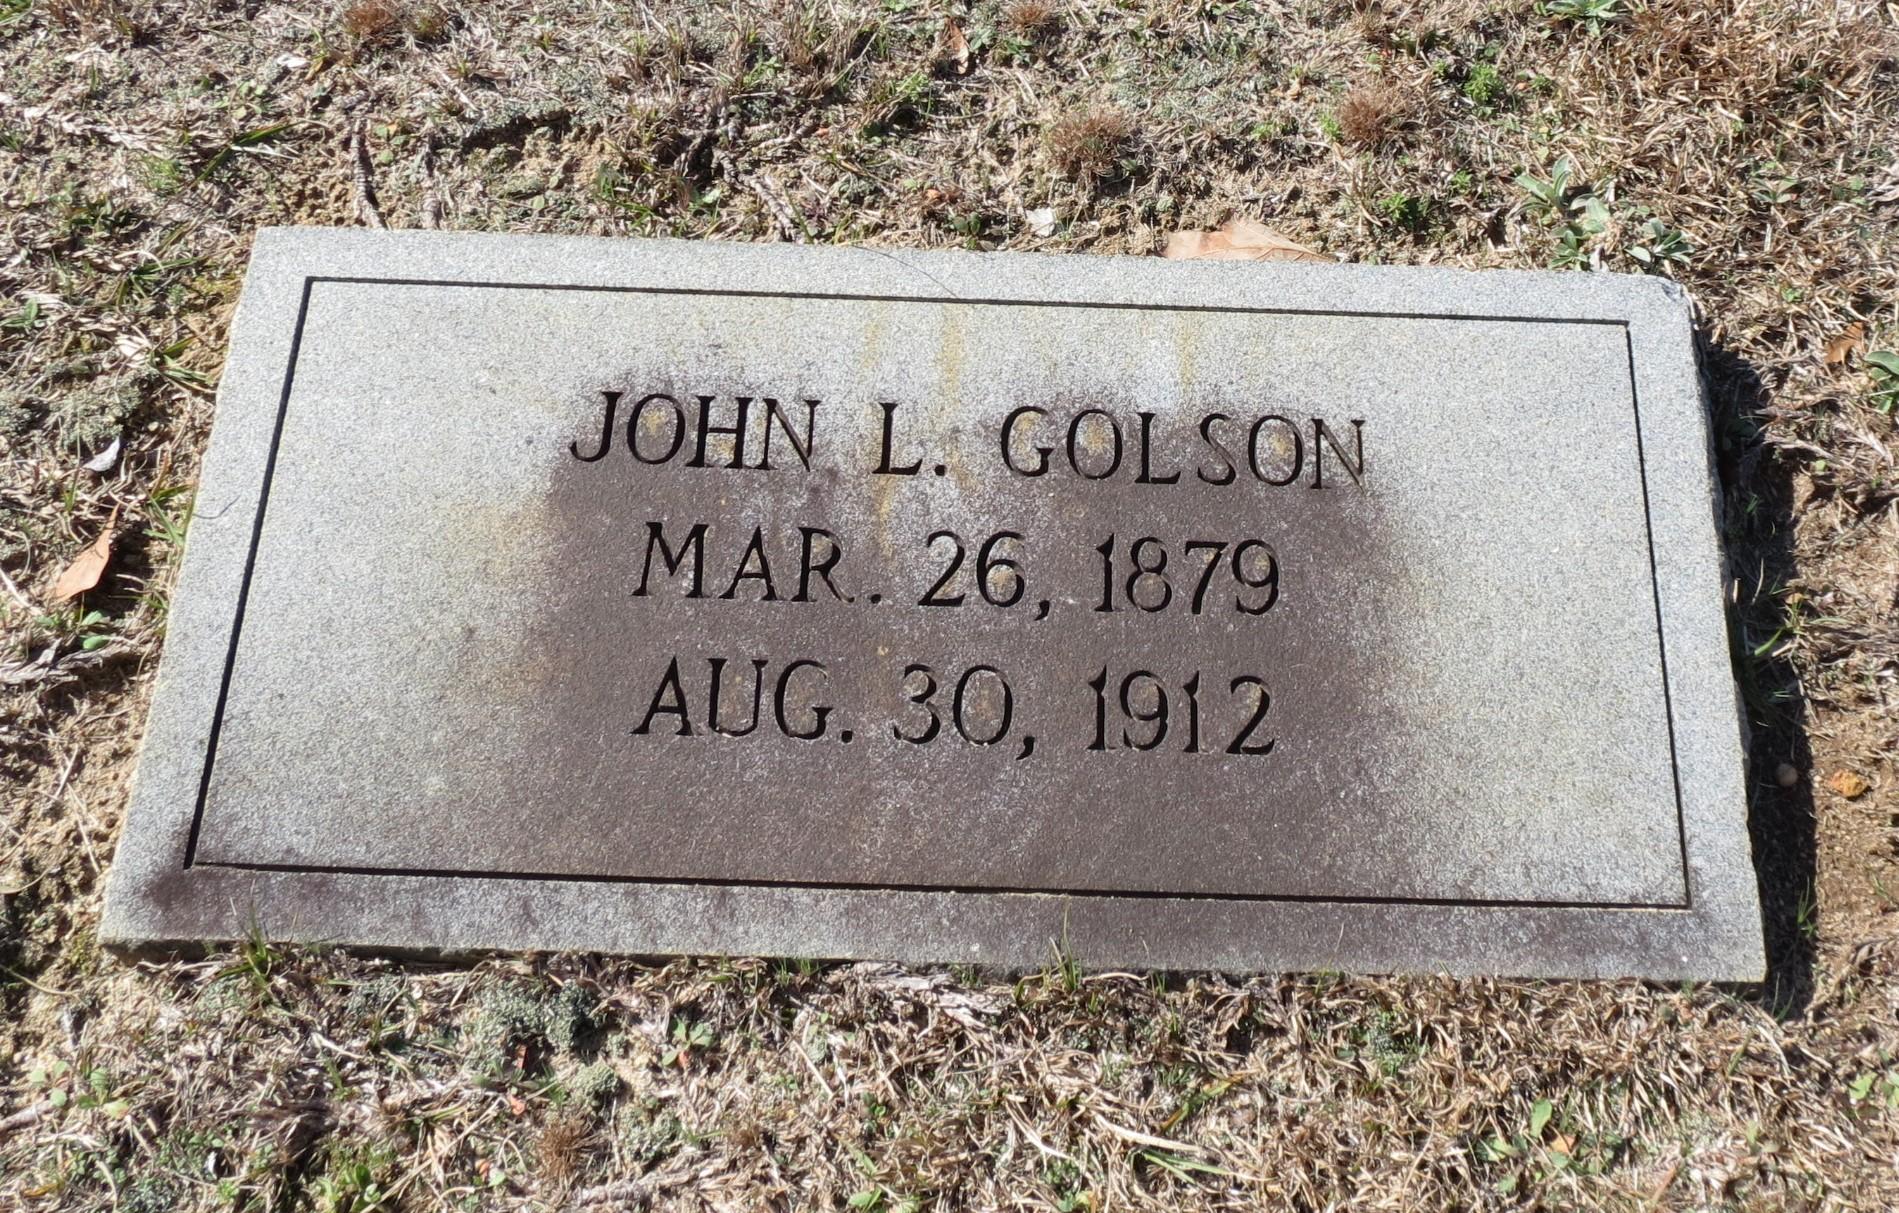 John L. Golson